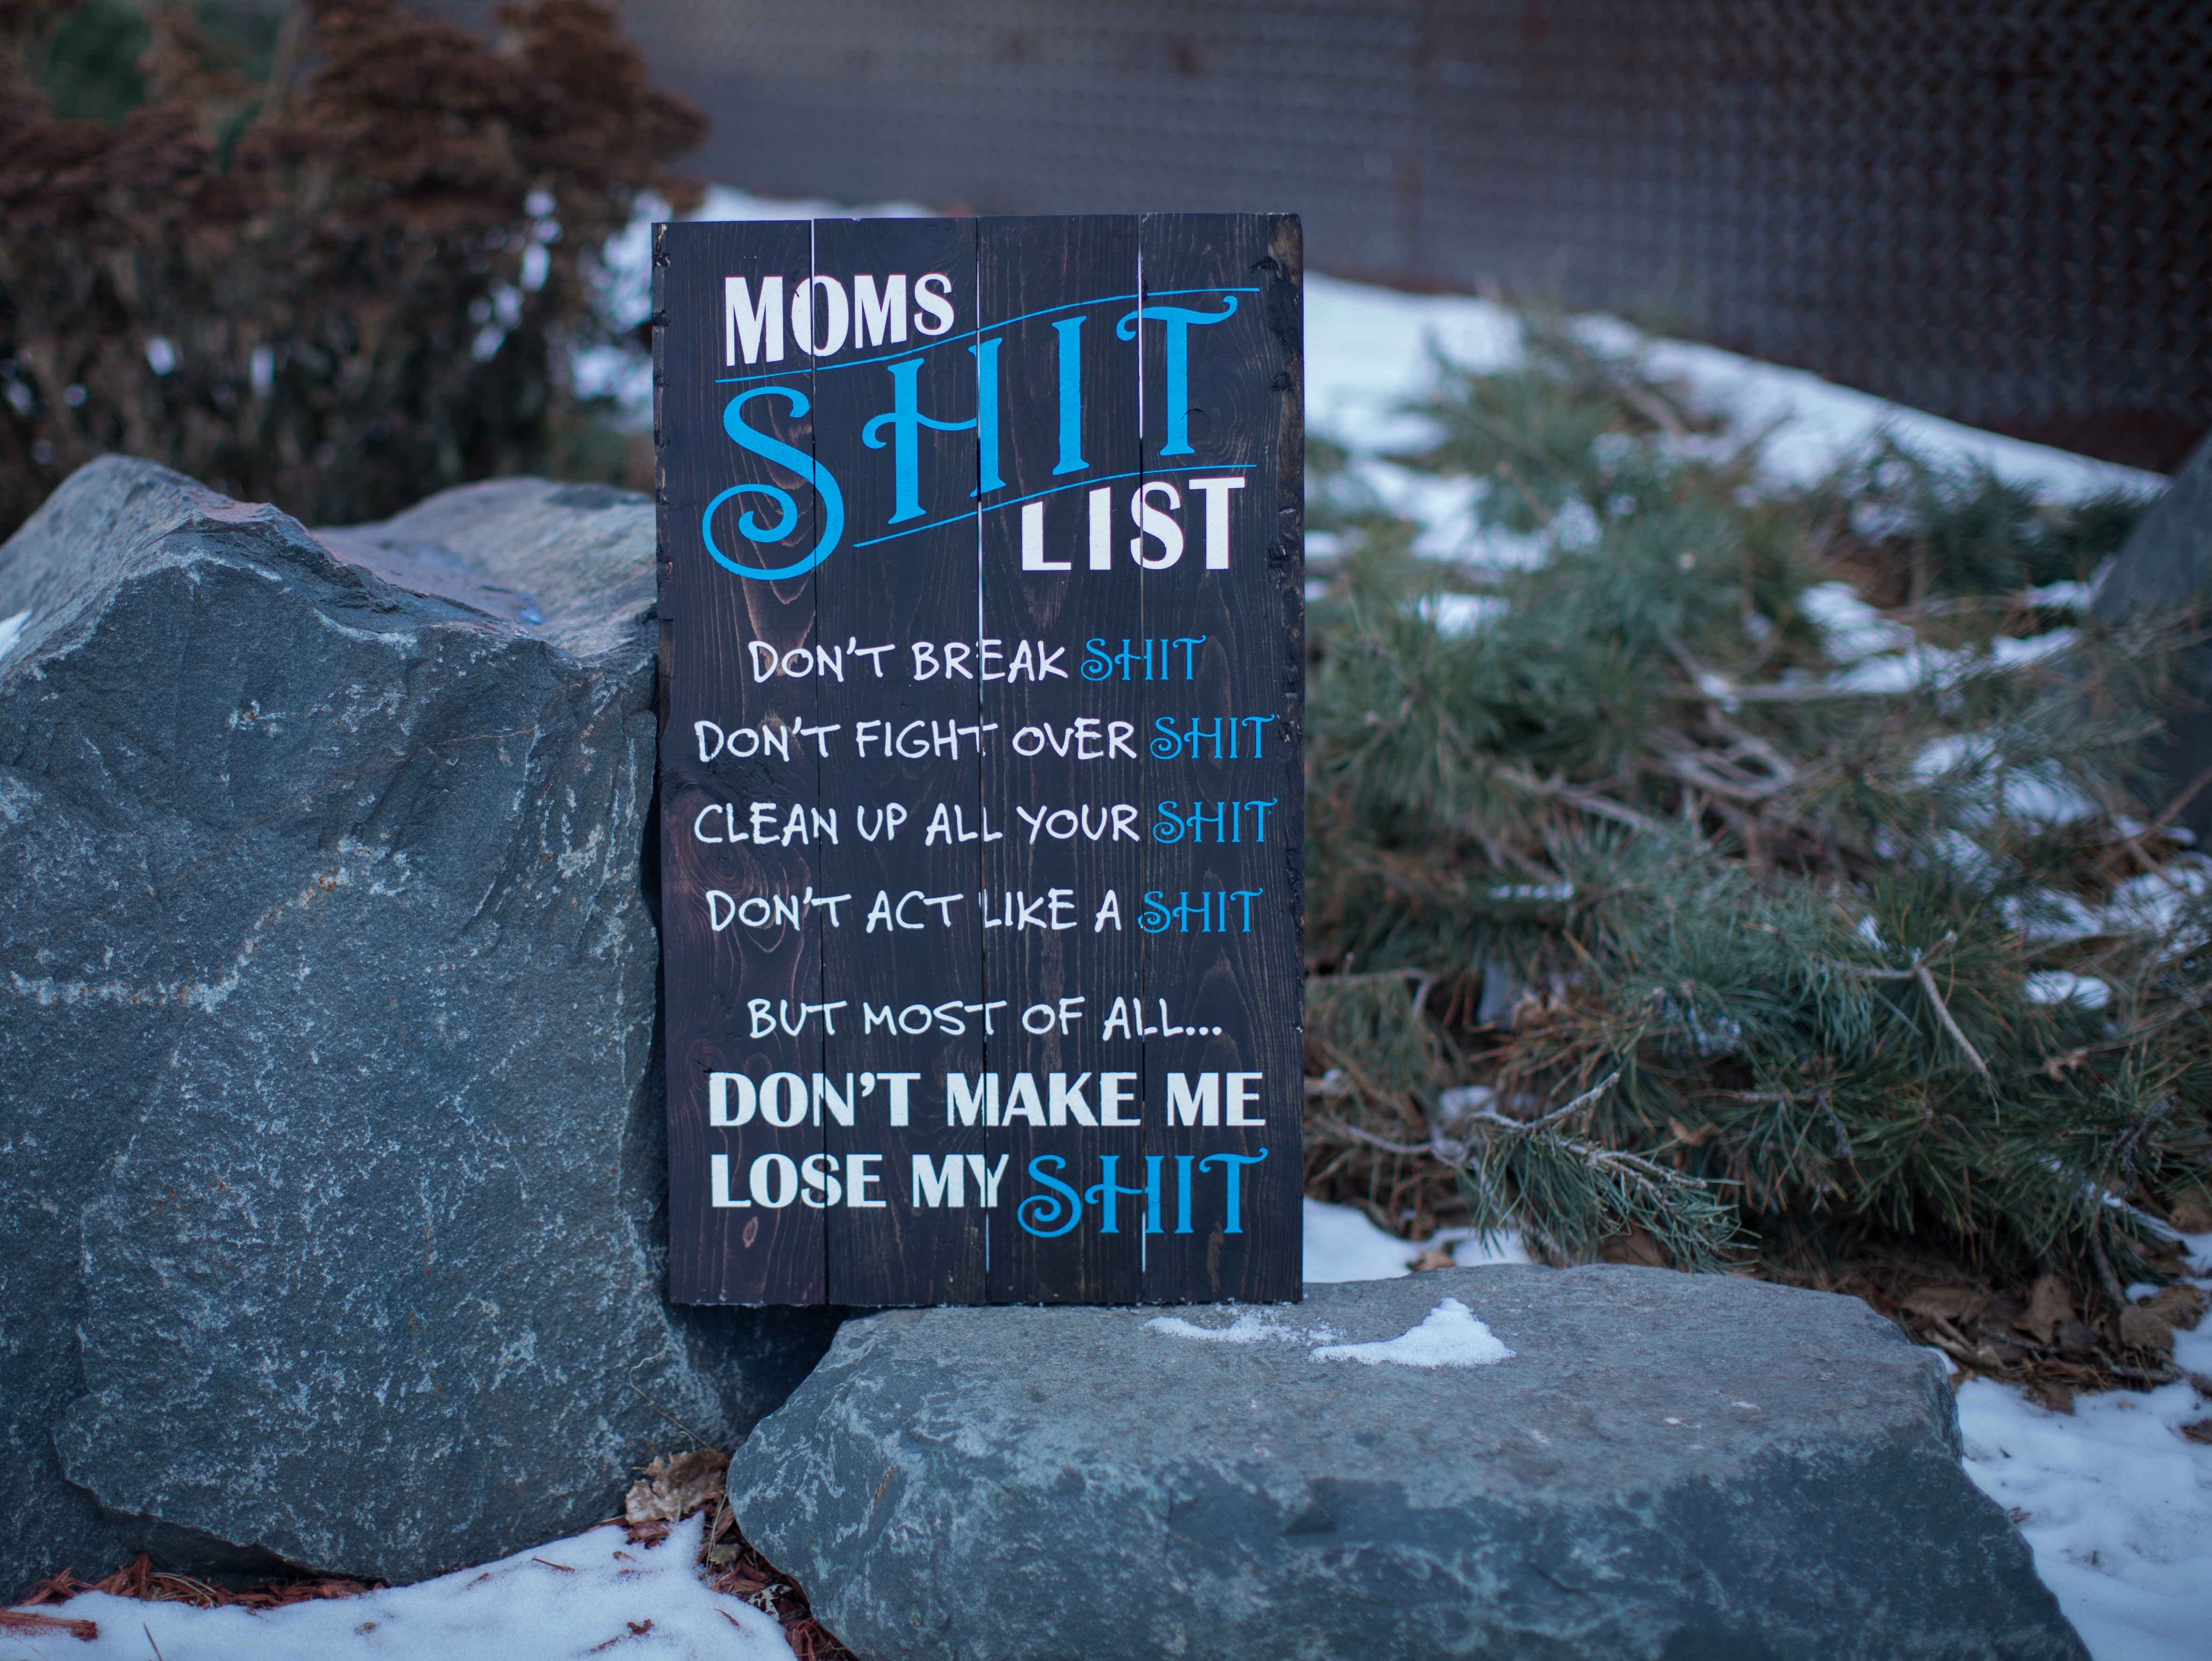 44) Moms Shit List